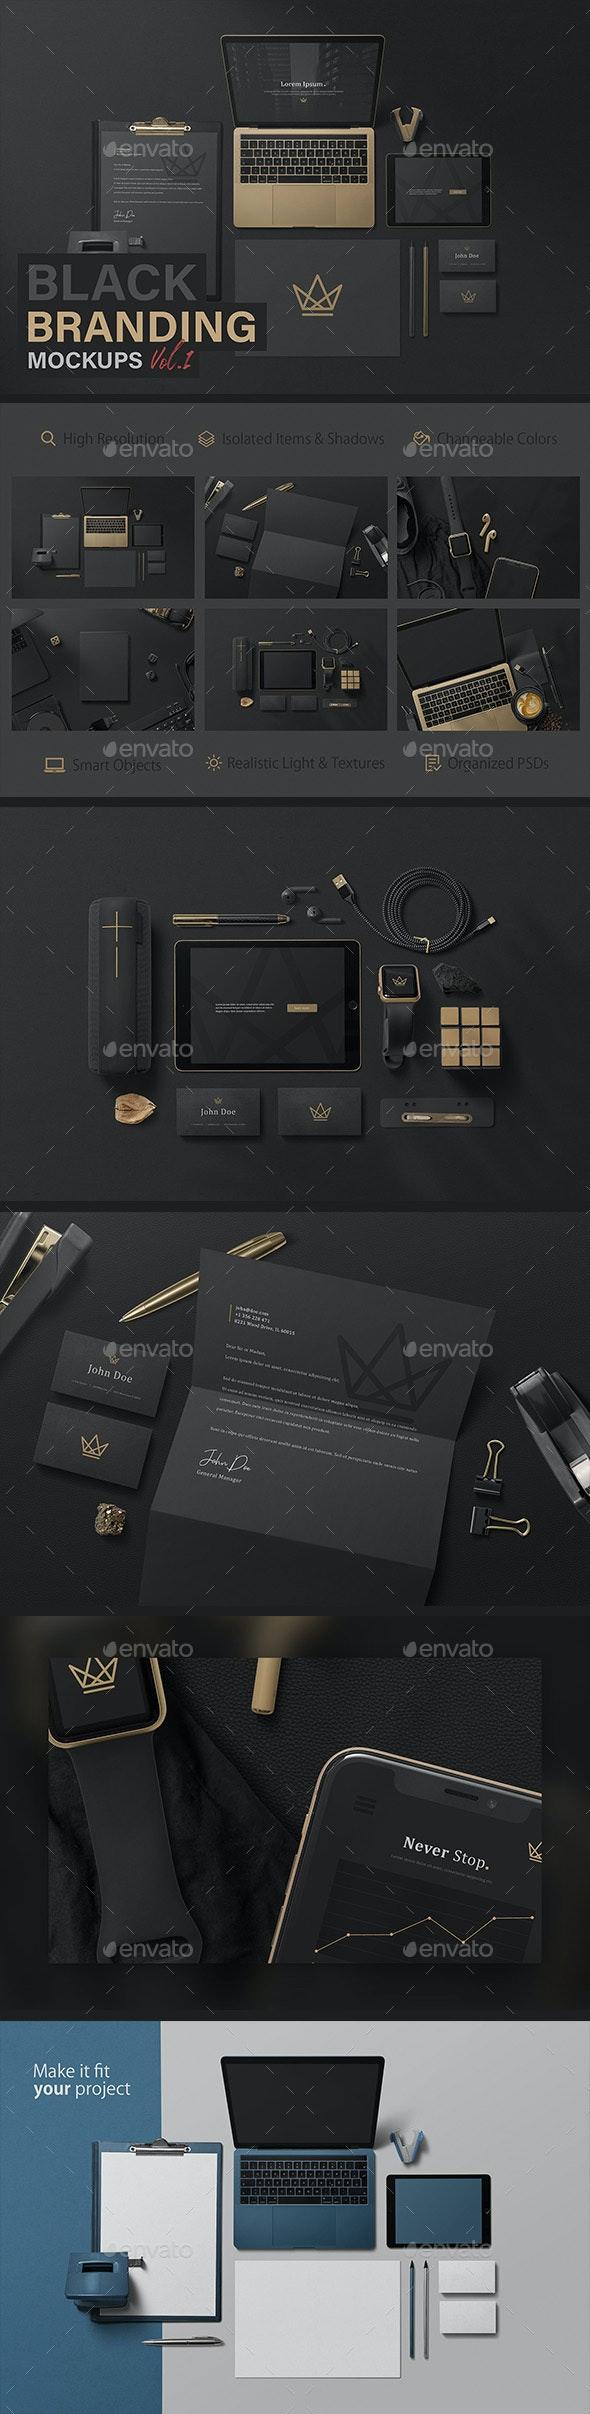 Black Branding Mockups Vol.1 - Miscellaneous Product Mock-Ups